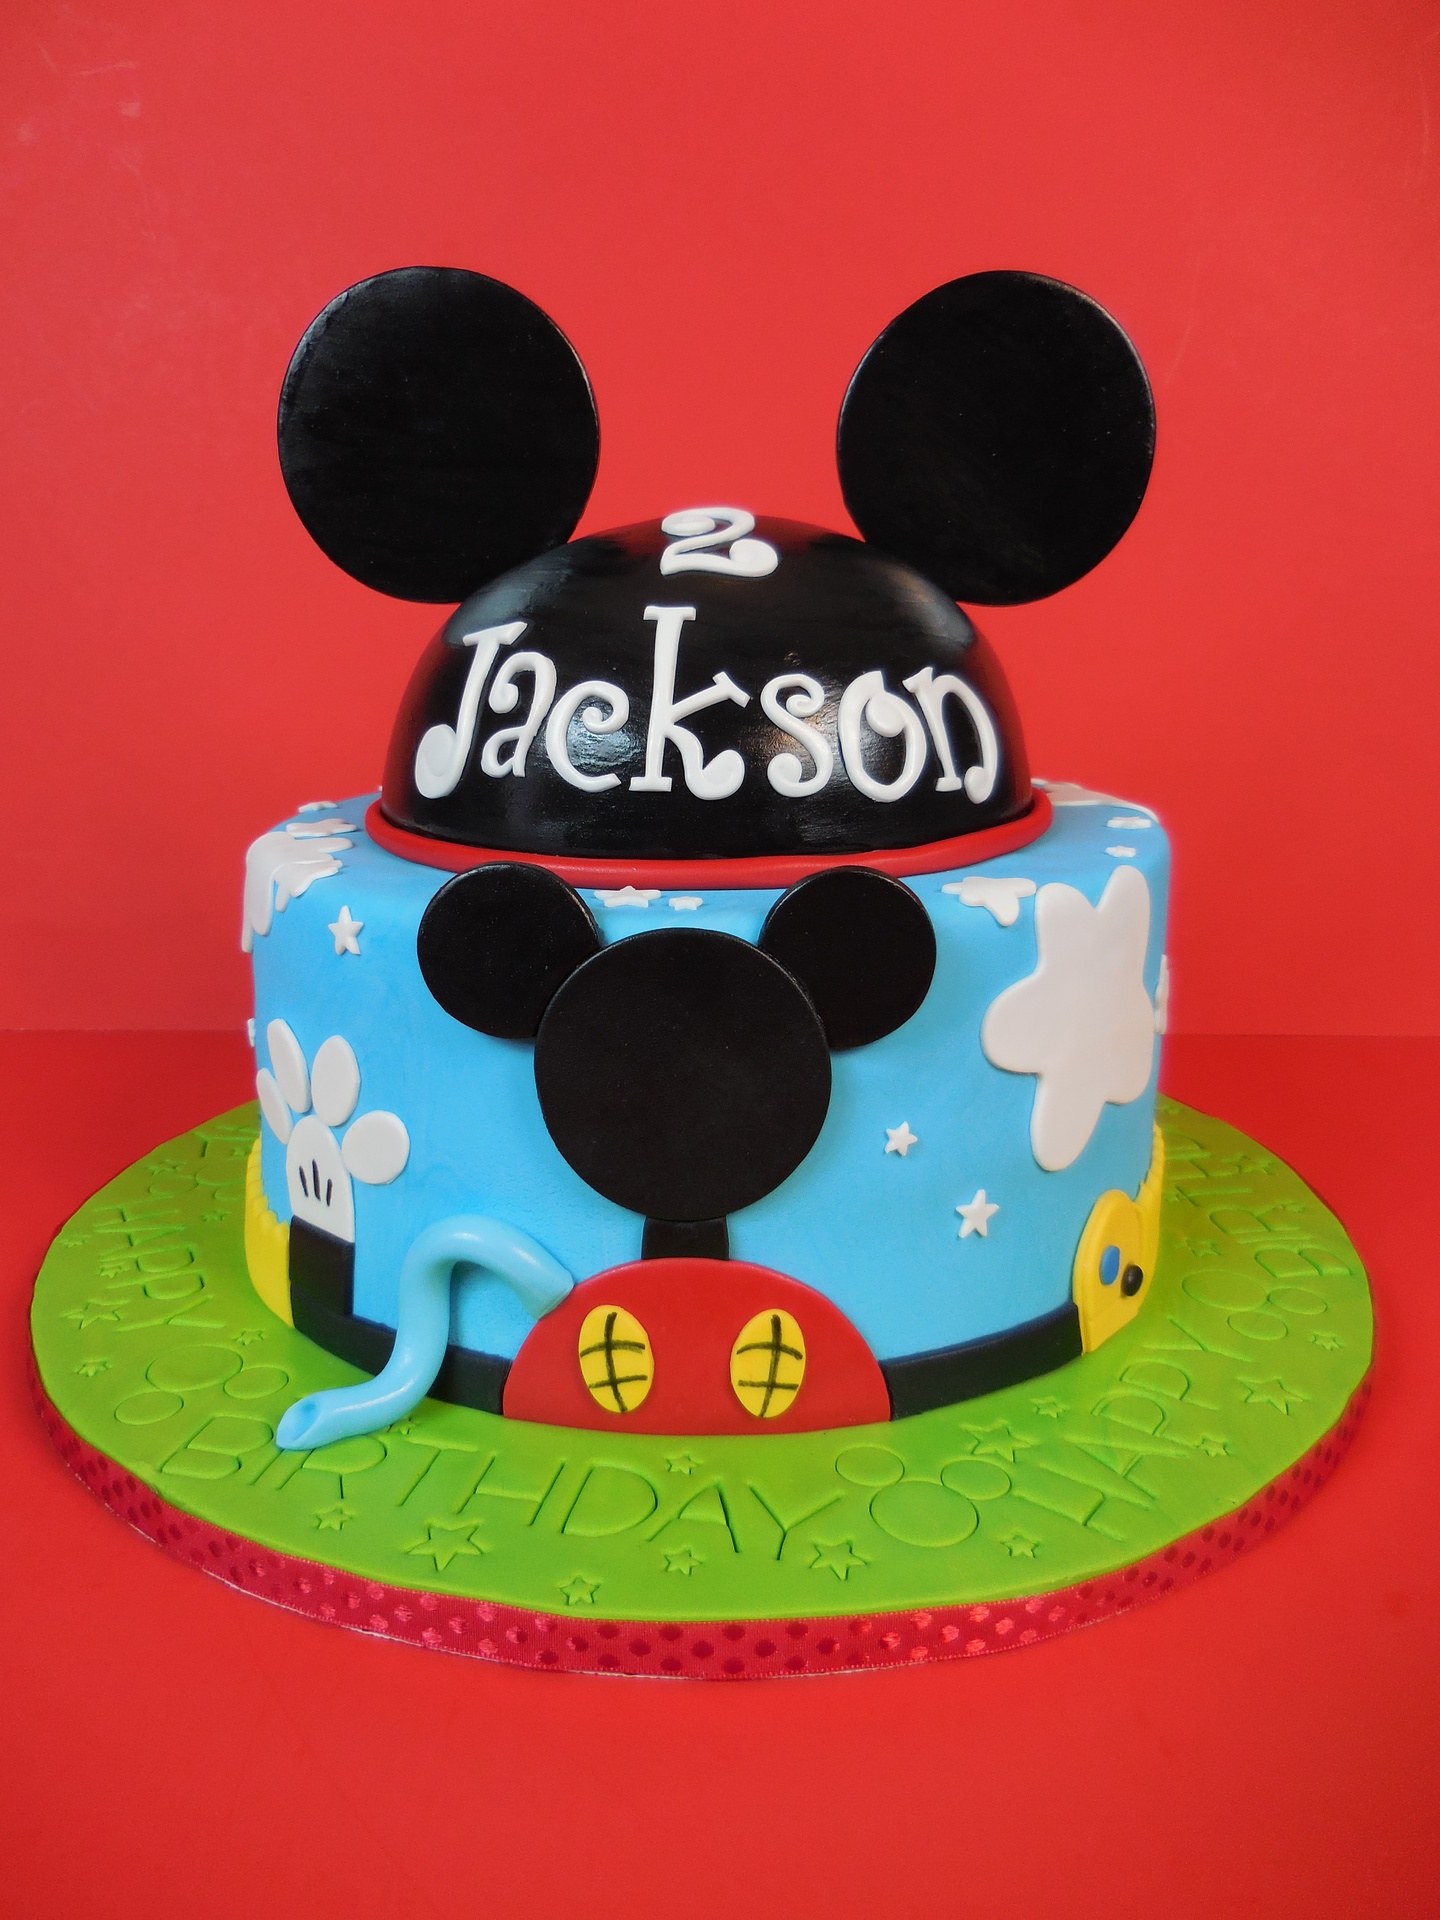 Jackson's Mickey Mouse Club House Birthday